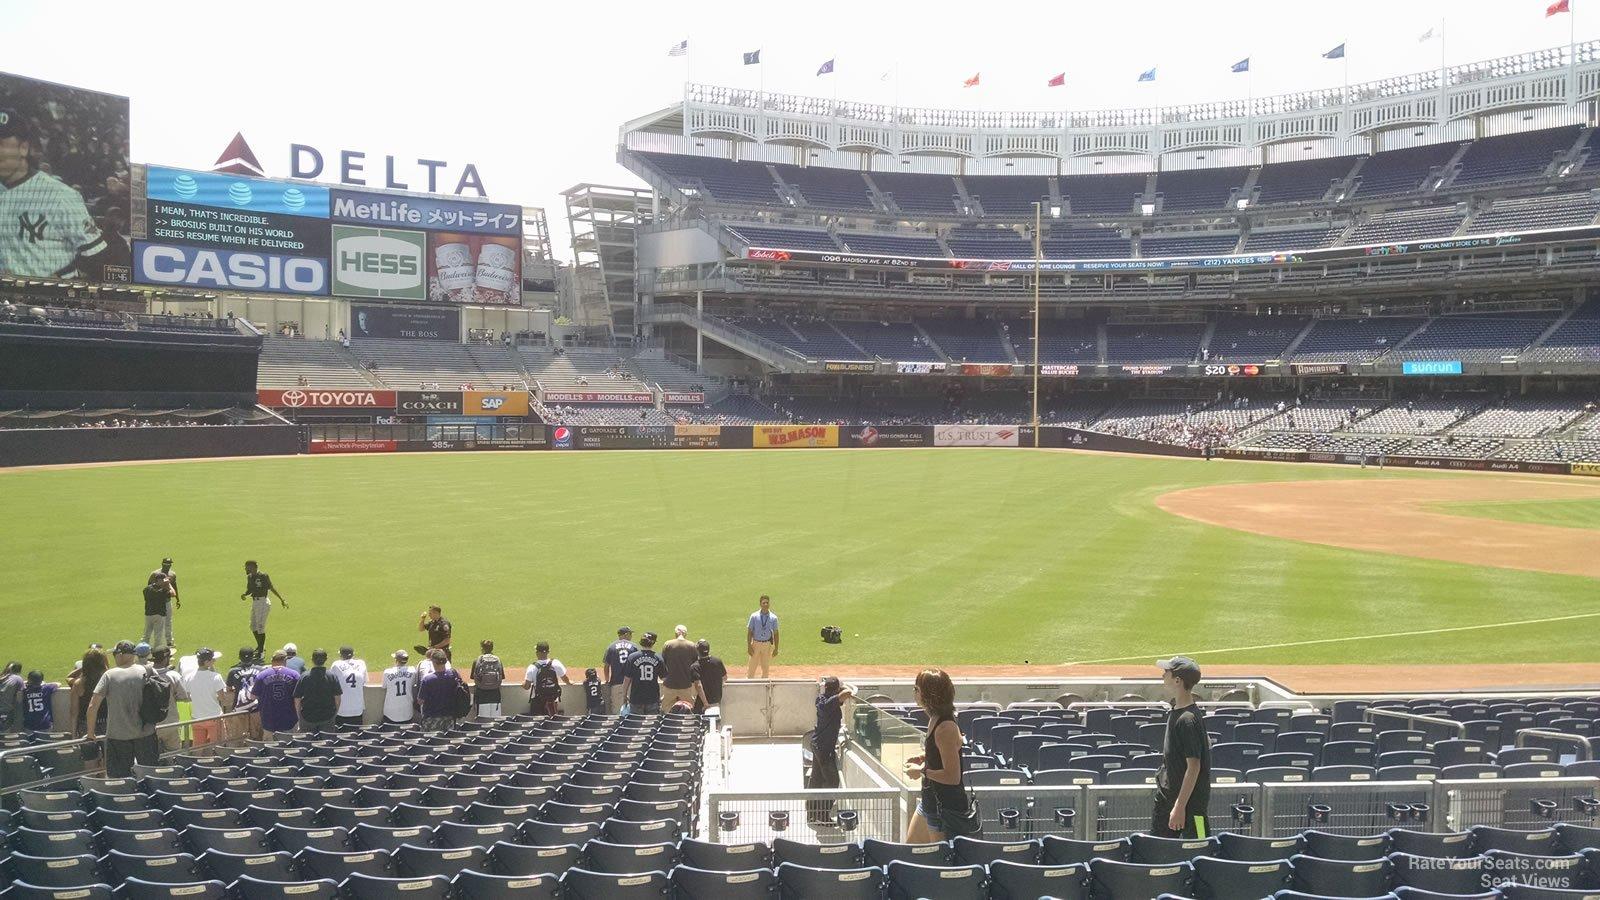 Yankee Stadium Section 129 - New York Yankees - RateYourSeats.com